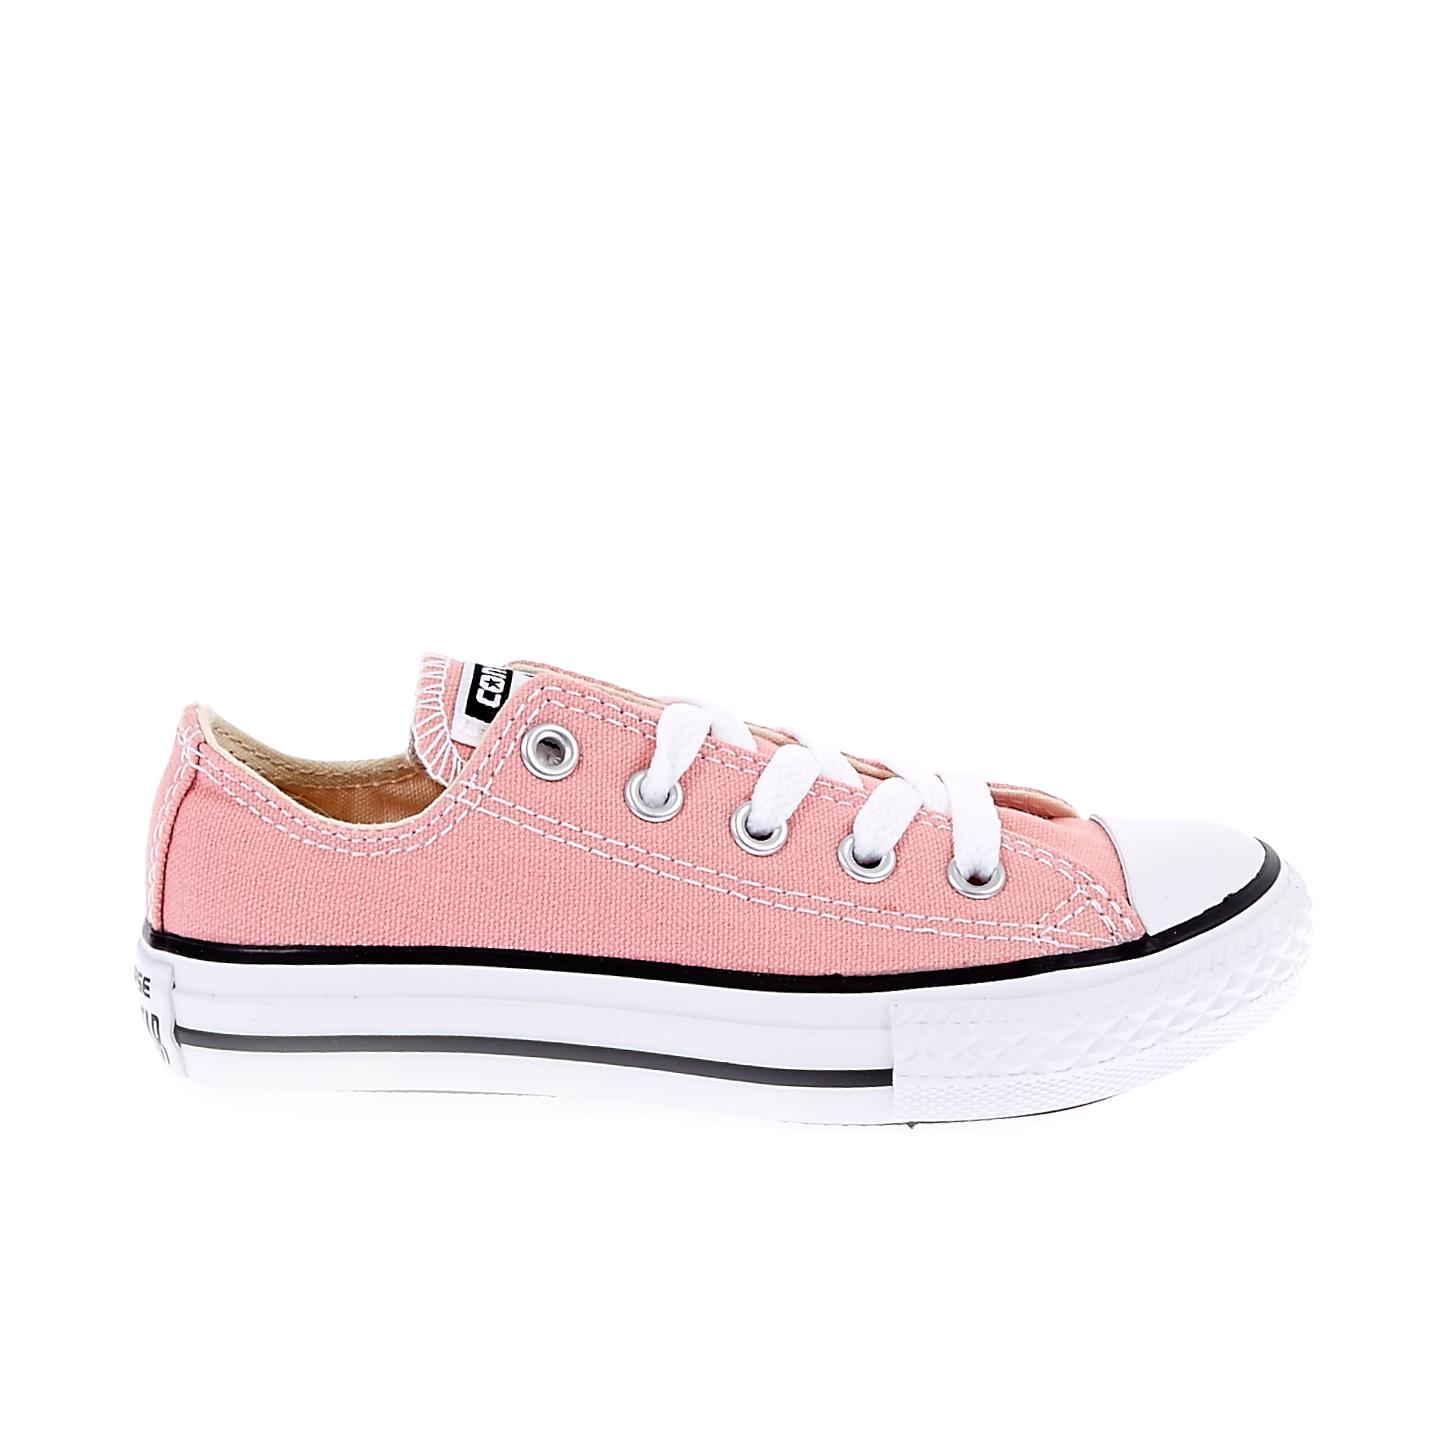 CONVERSE – Παιδικά παπούτσια Chuck Taylor All Star Ox ροζ